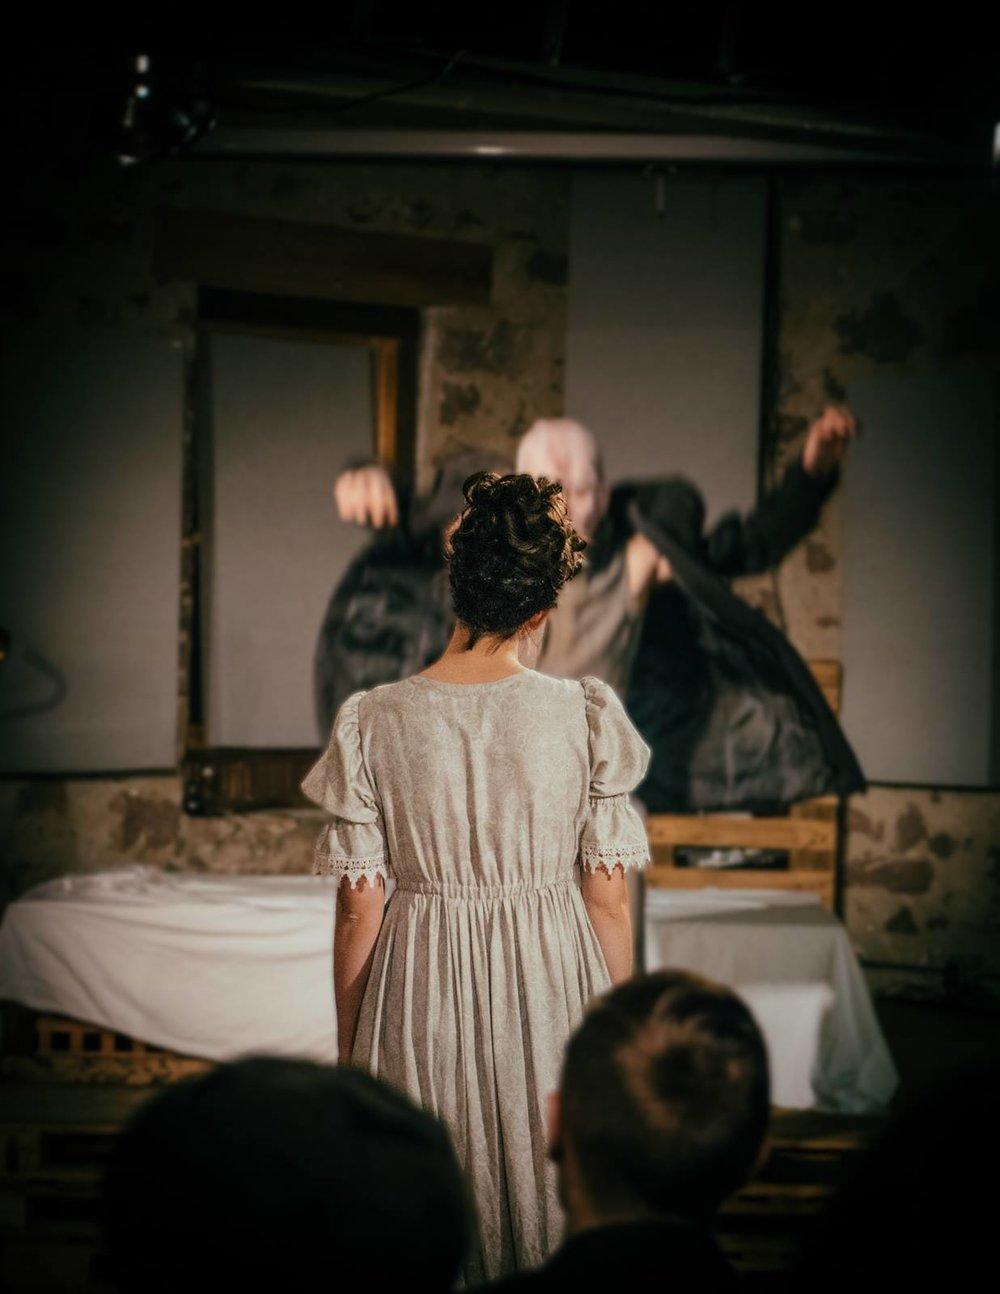 Alastar Dimitrie as Adam, Mary Wardell as Elizabeth. Photo by Gavin Gibson.